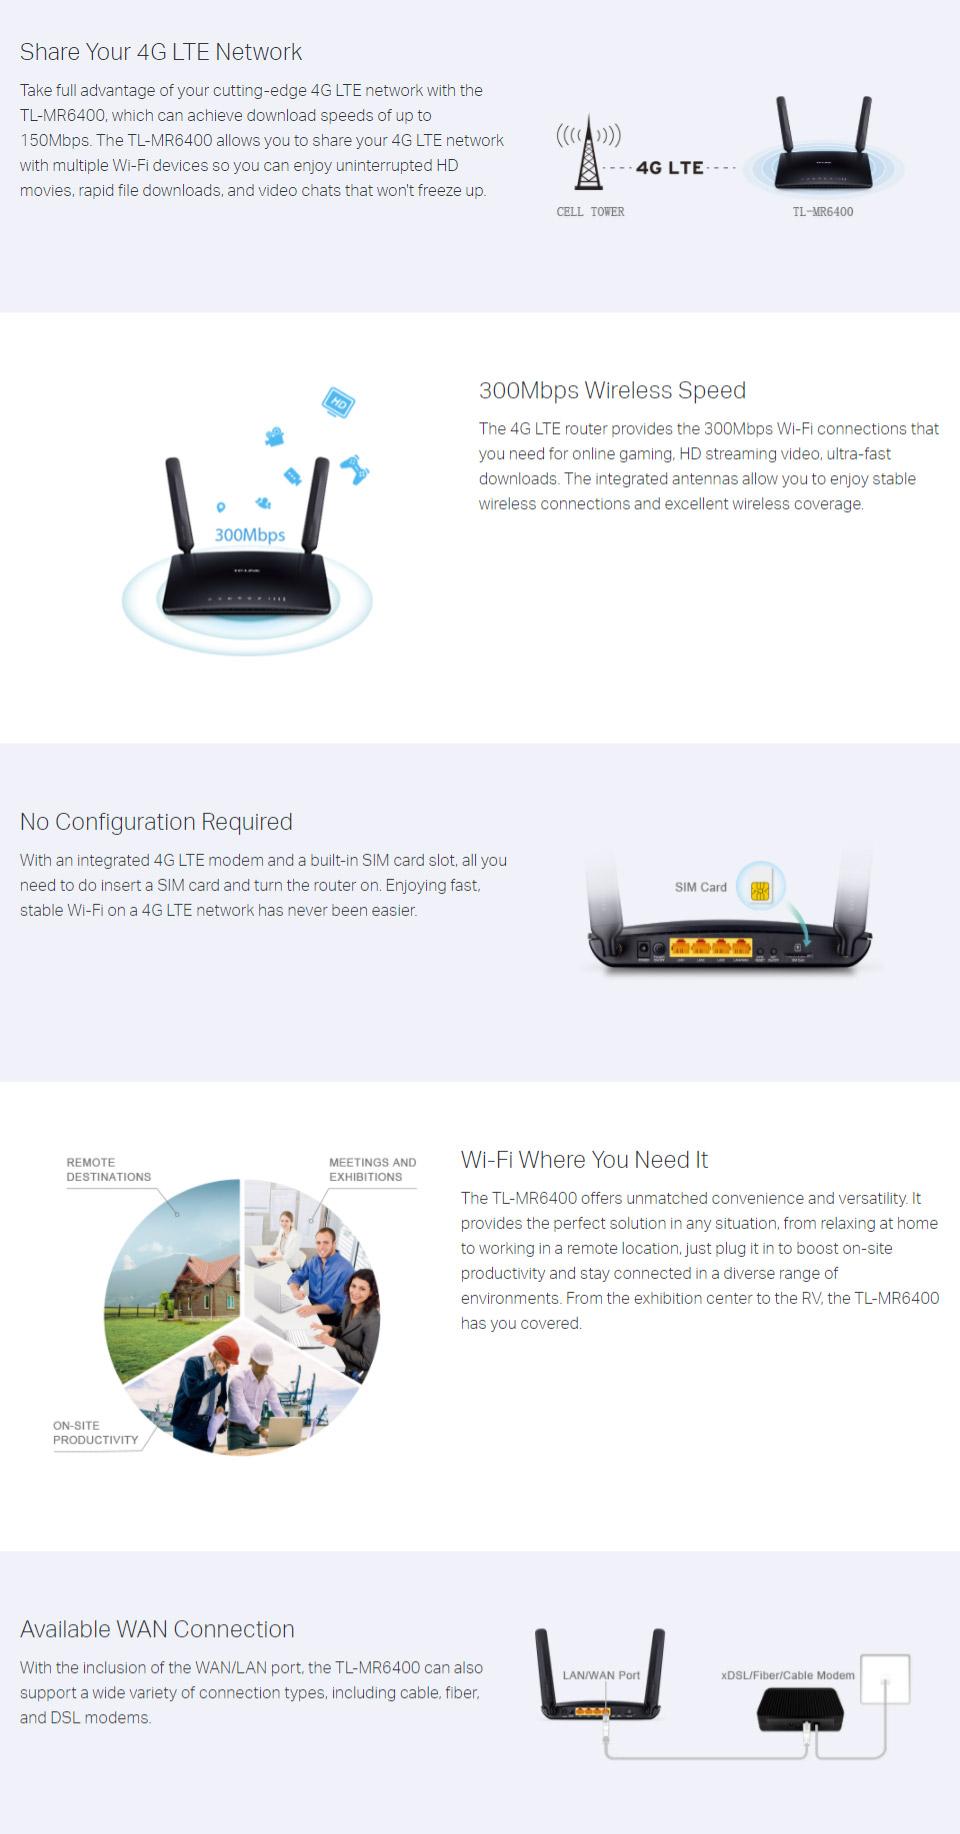 Tp Link Tl Mr6400 300mbps Wireless N 4g Lte Router Allneeds Computers Home Network Broadcom Diagram Chipset Maximizes Modem Compatibility Gigabit Ethernet Ports Ensure Ultrafast Data Transfer Speeds Tether App Provides Easy Management At